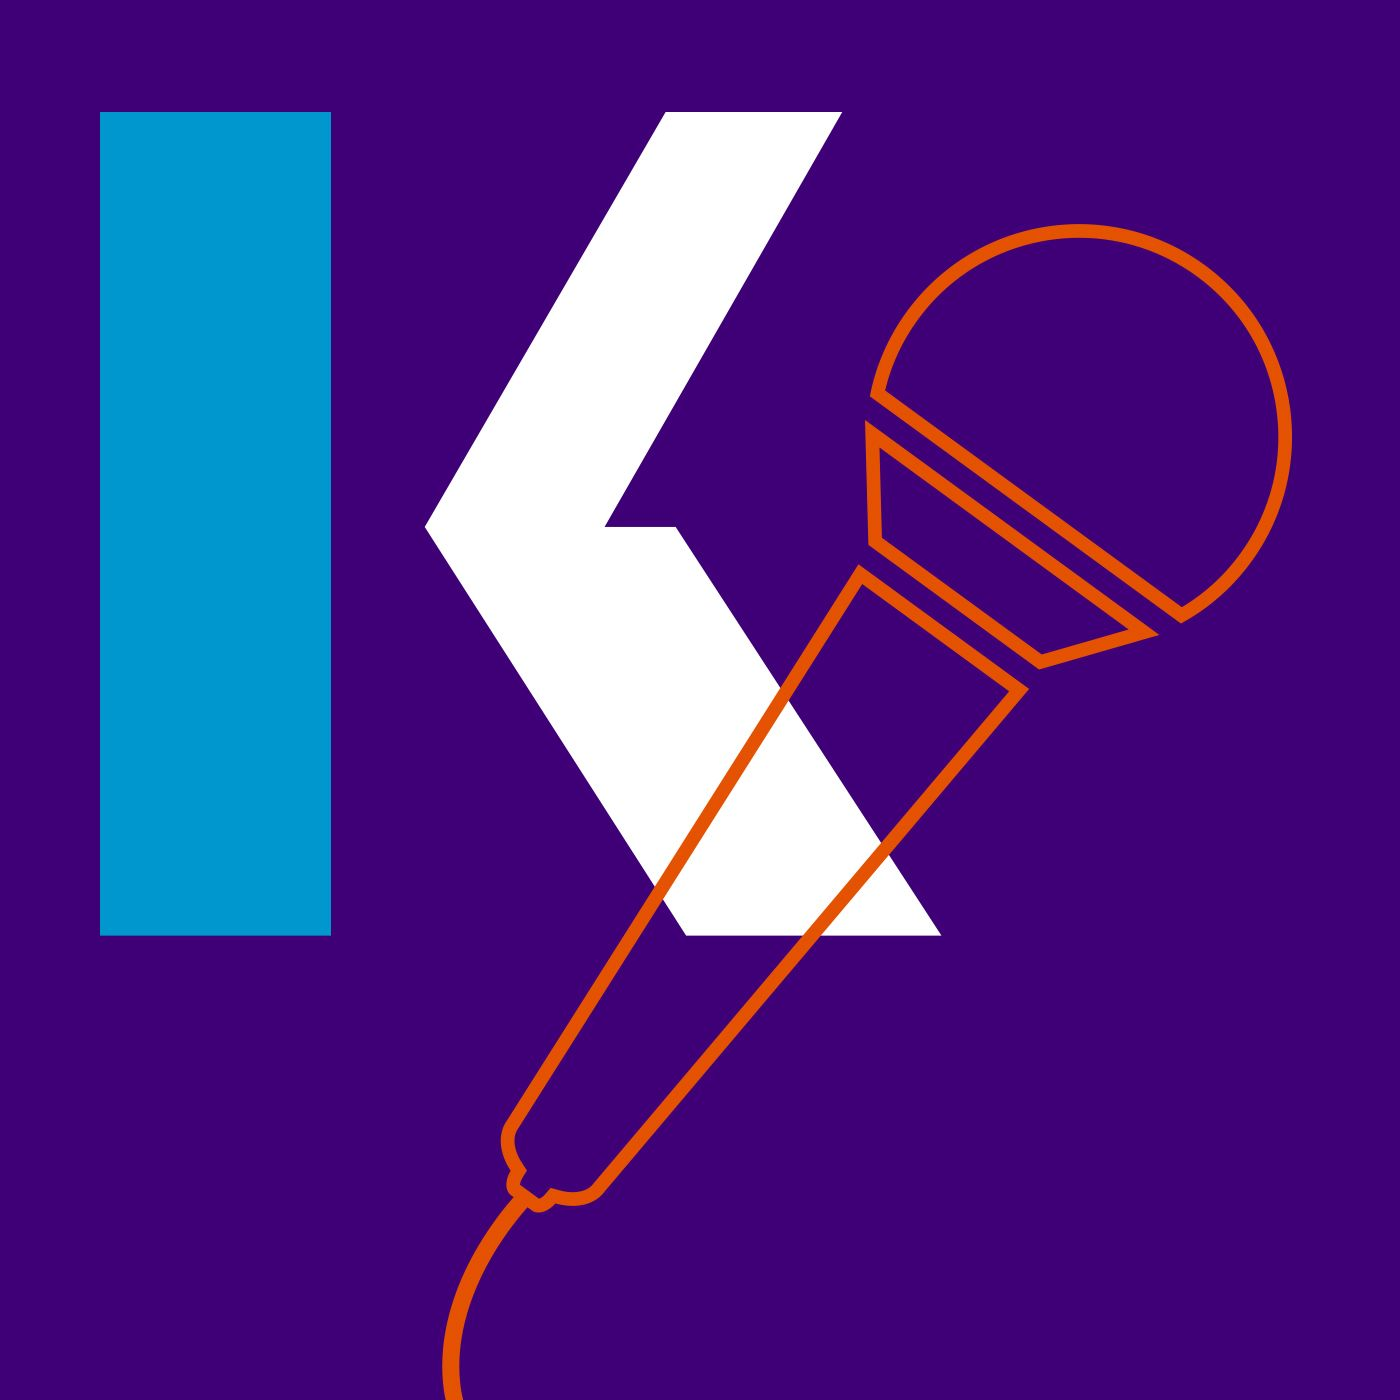 Kaplan's NCLEX Prepcast - Episode 29 - Nursing Informatics